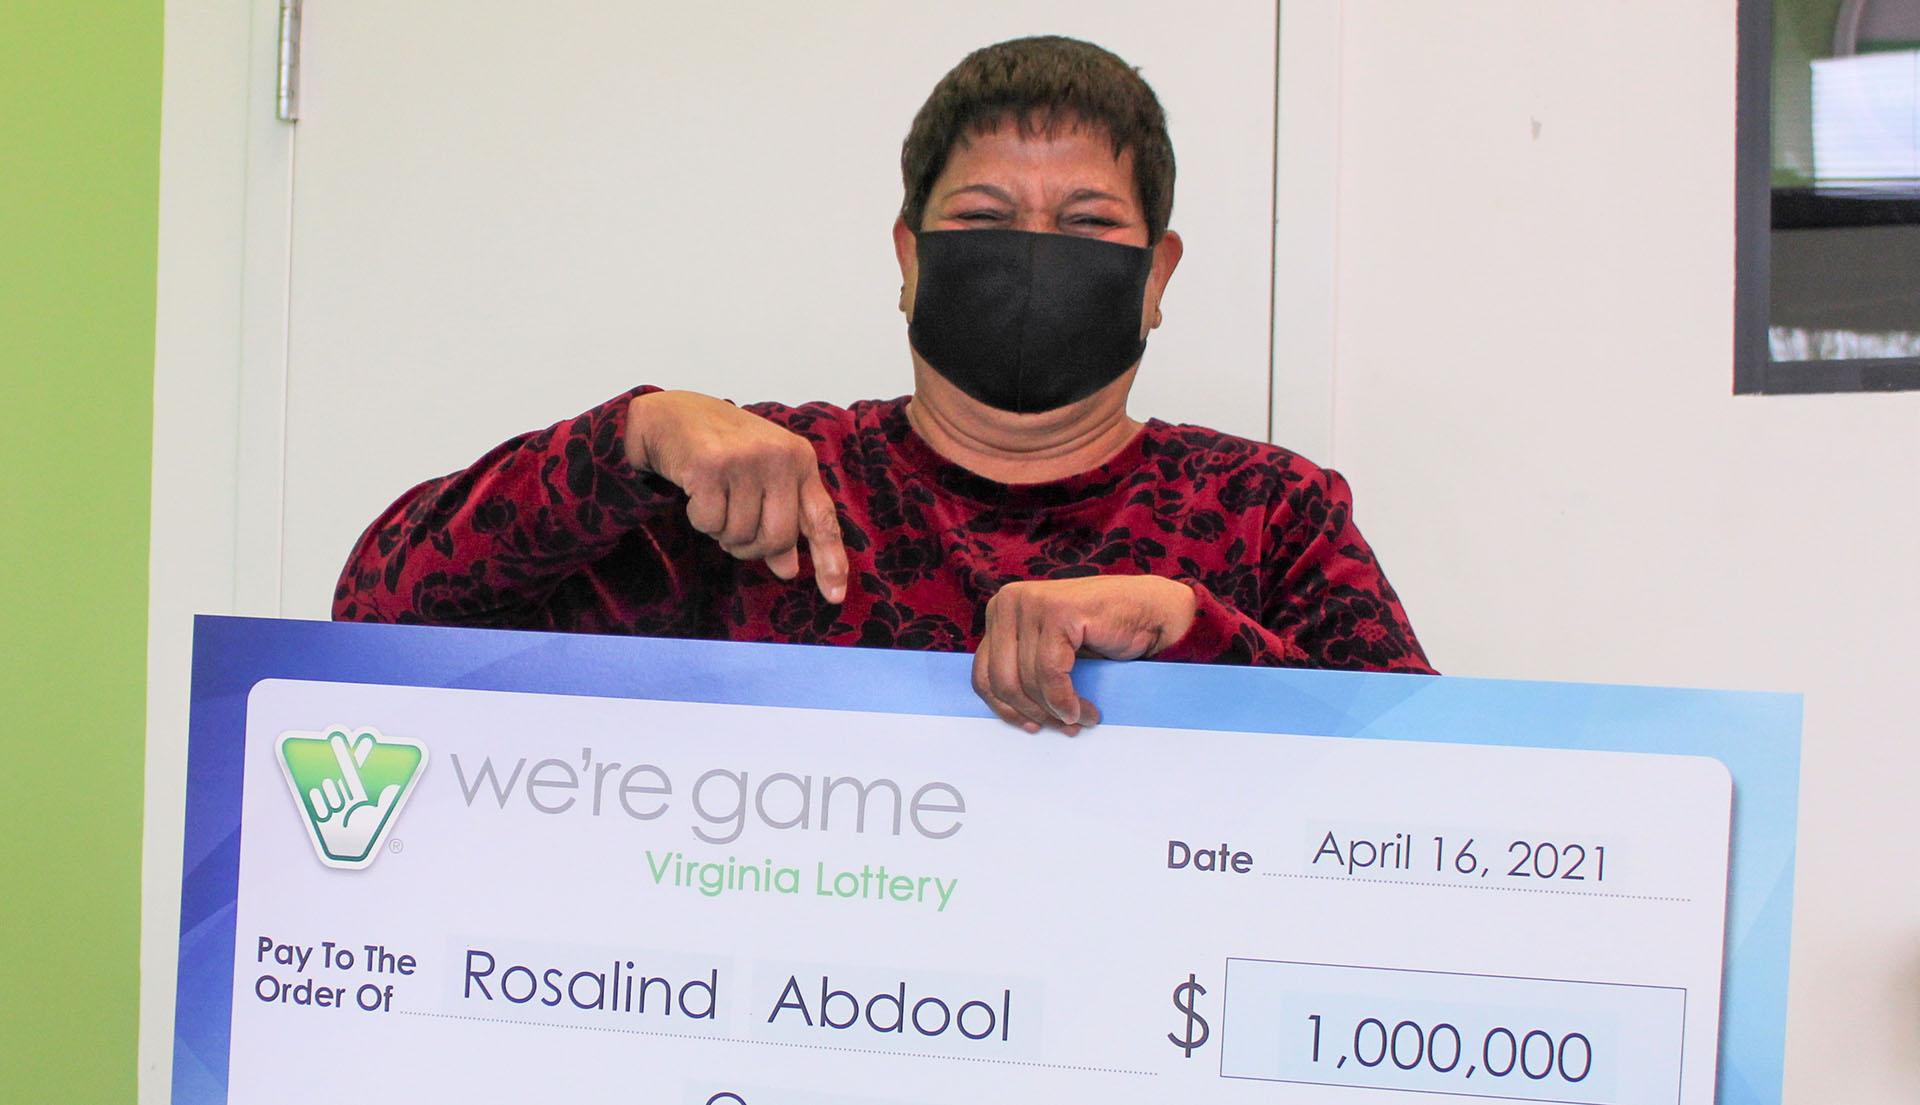 Manassas resident becomes Virginia Lottery winner